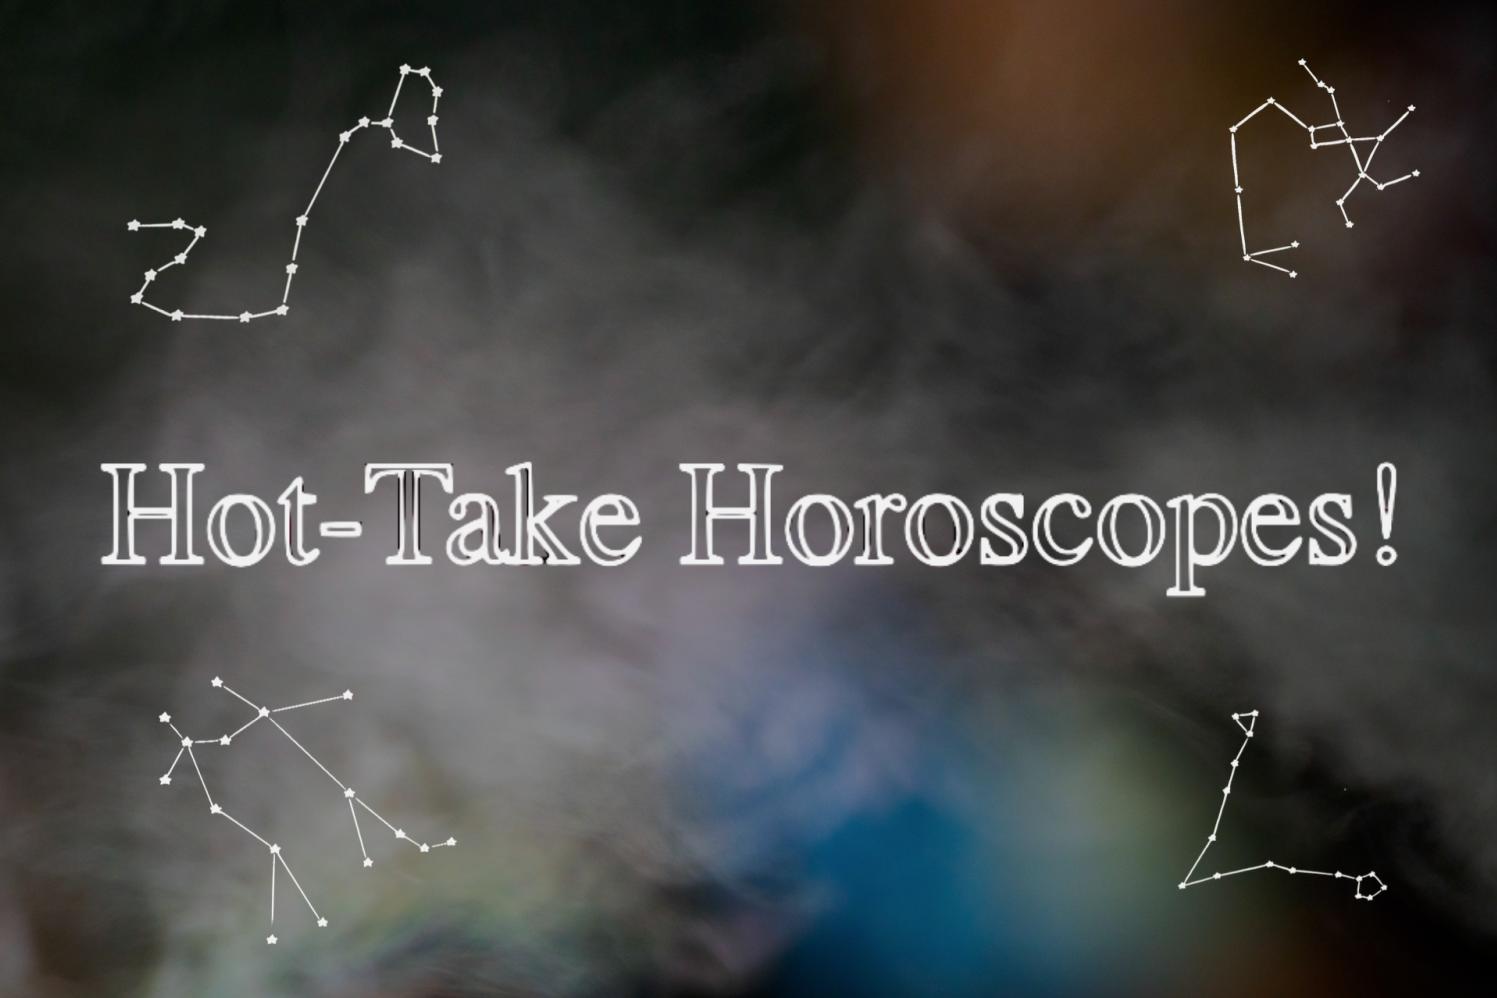 Hot-Take Horoscopes! – The Lodge